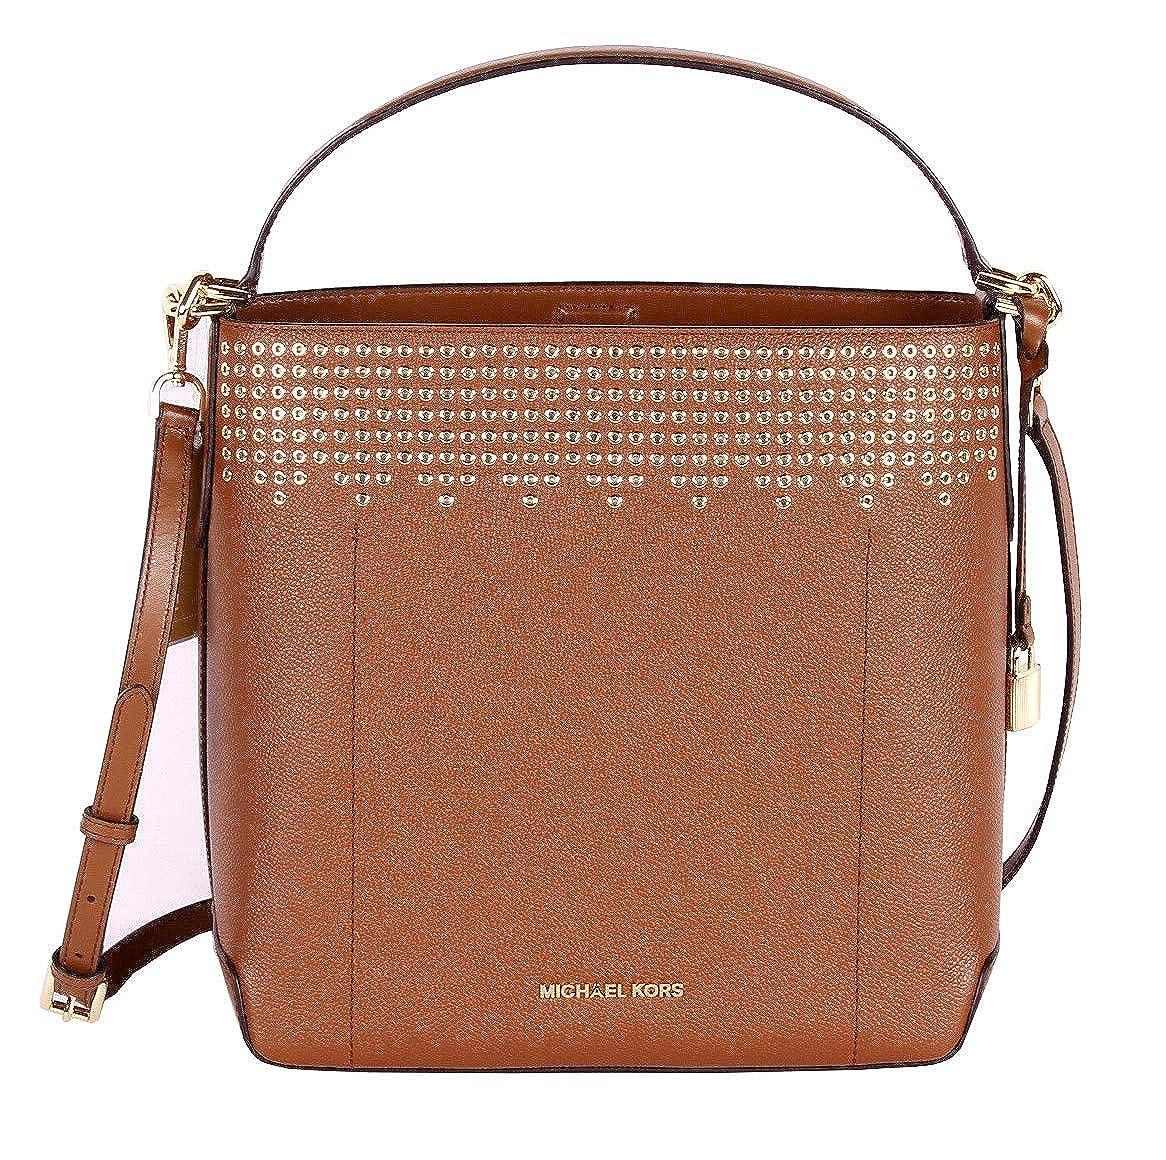 471631b1e6c925 MICHAEL Michael Kors Hayes Bucket Brown Large Shoulder Bag - Luggage/Ballet:  Handbags: Amazon.com